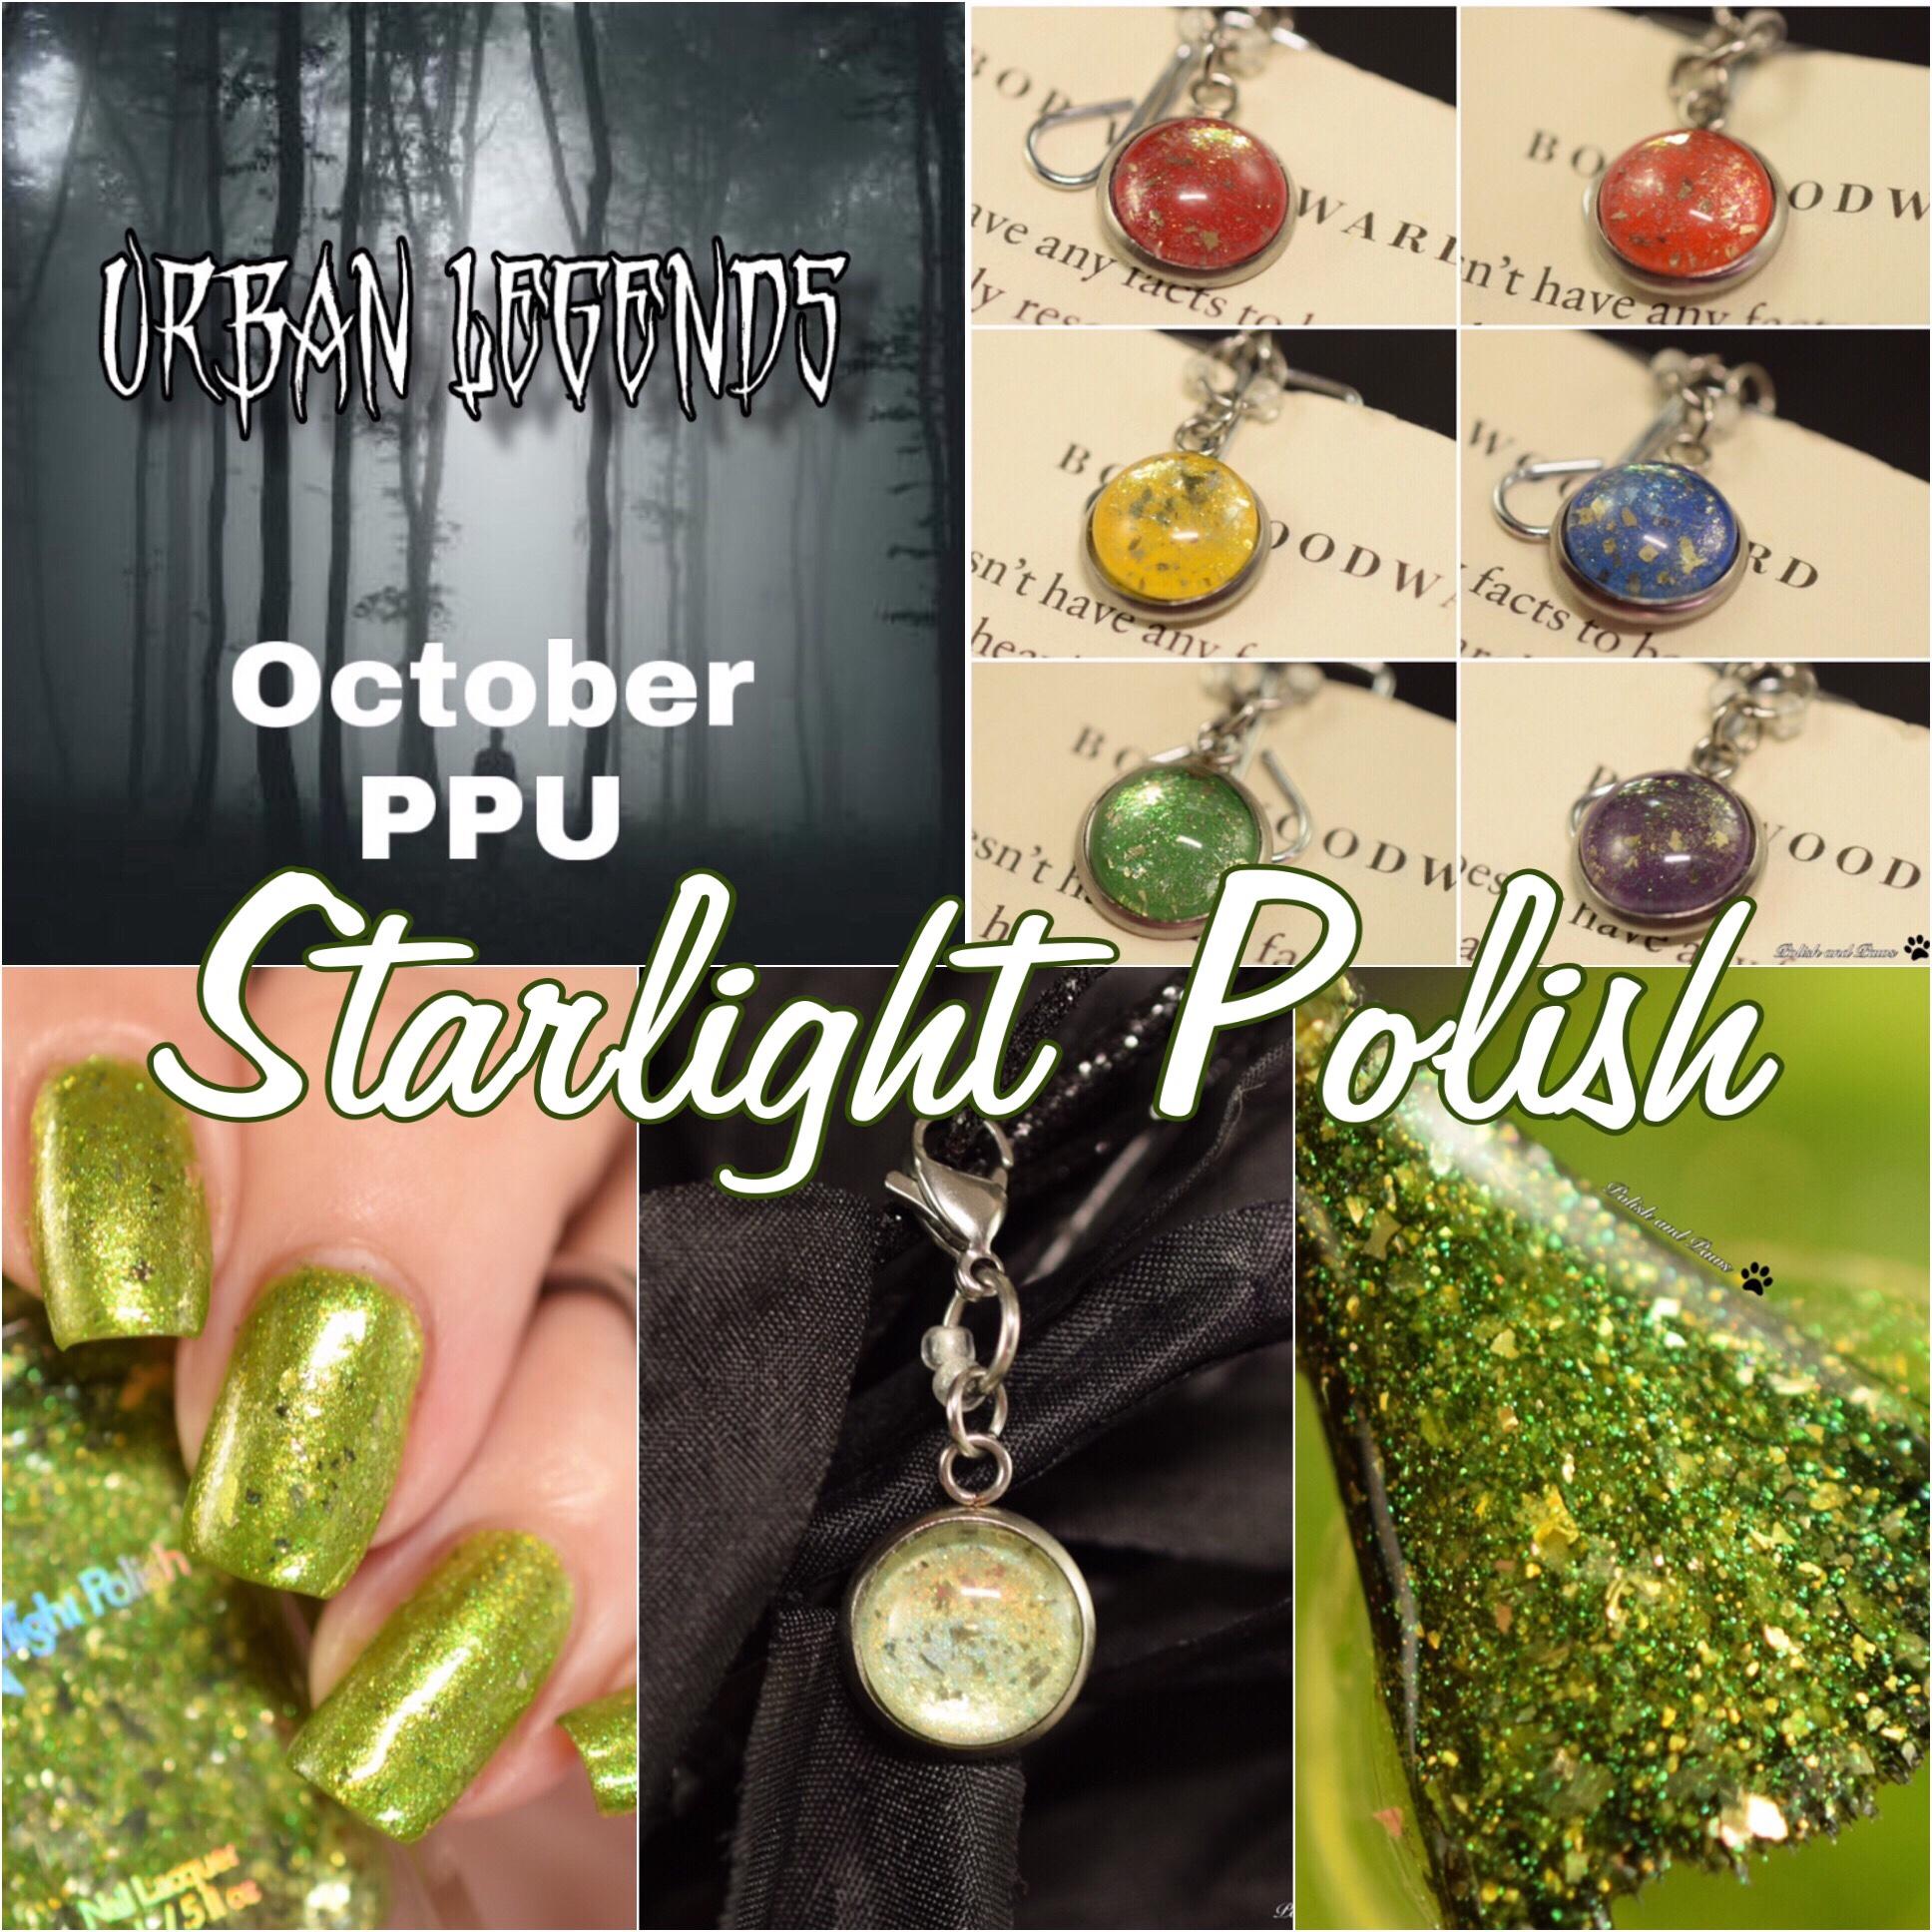 Starlight Polish PPU/IPU